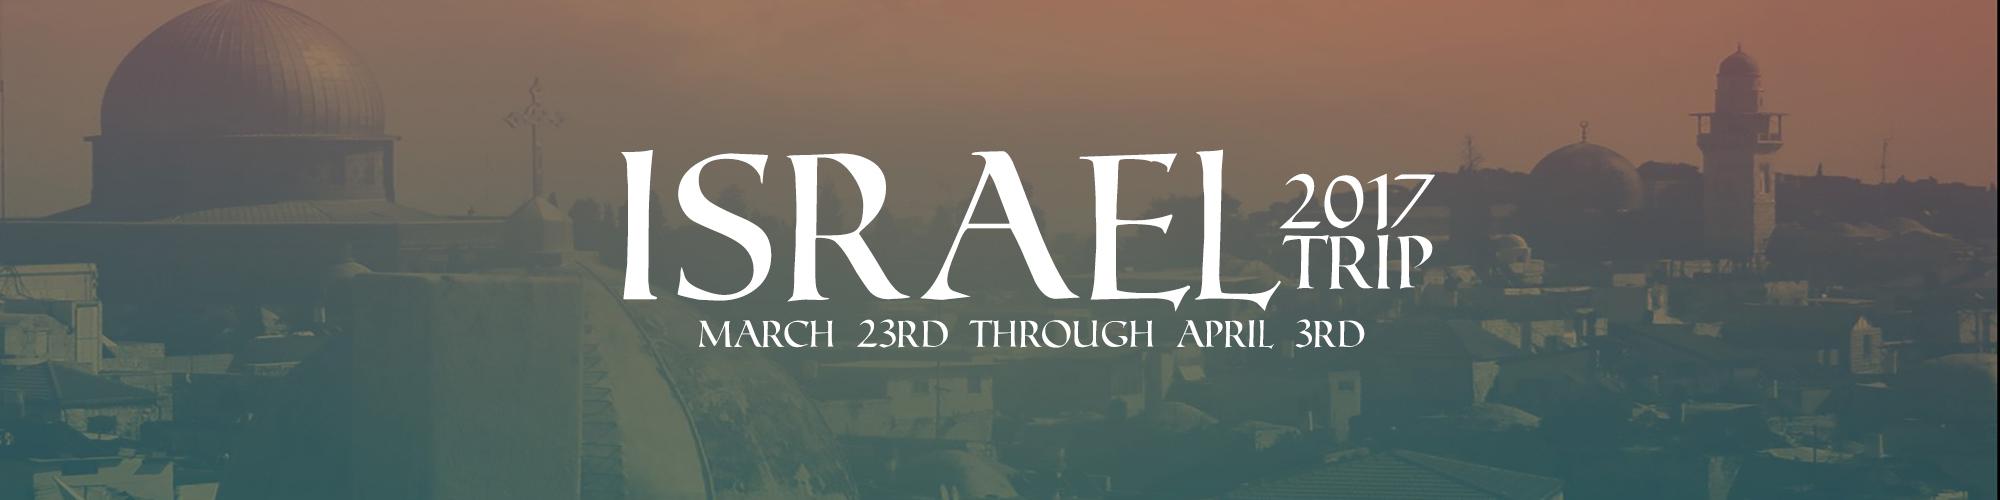 israel2017trip